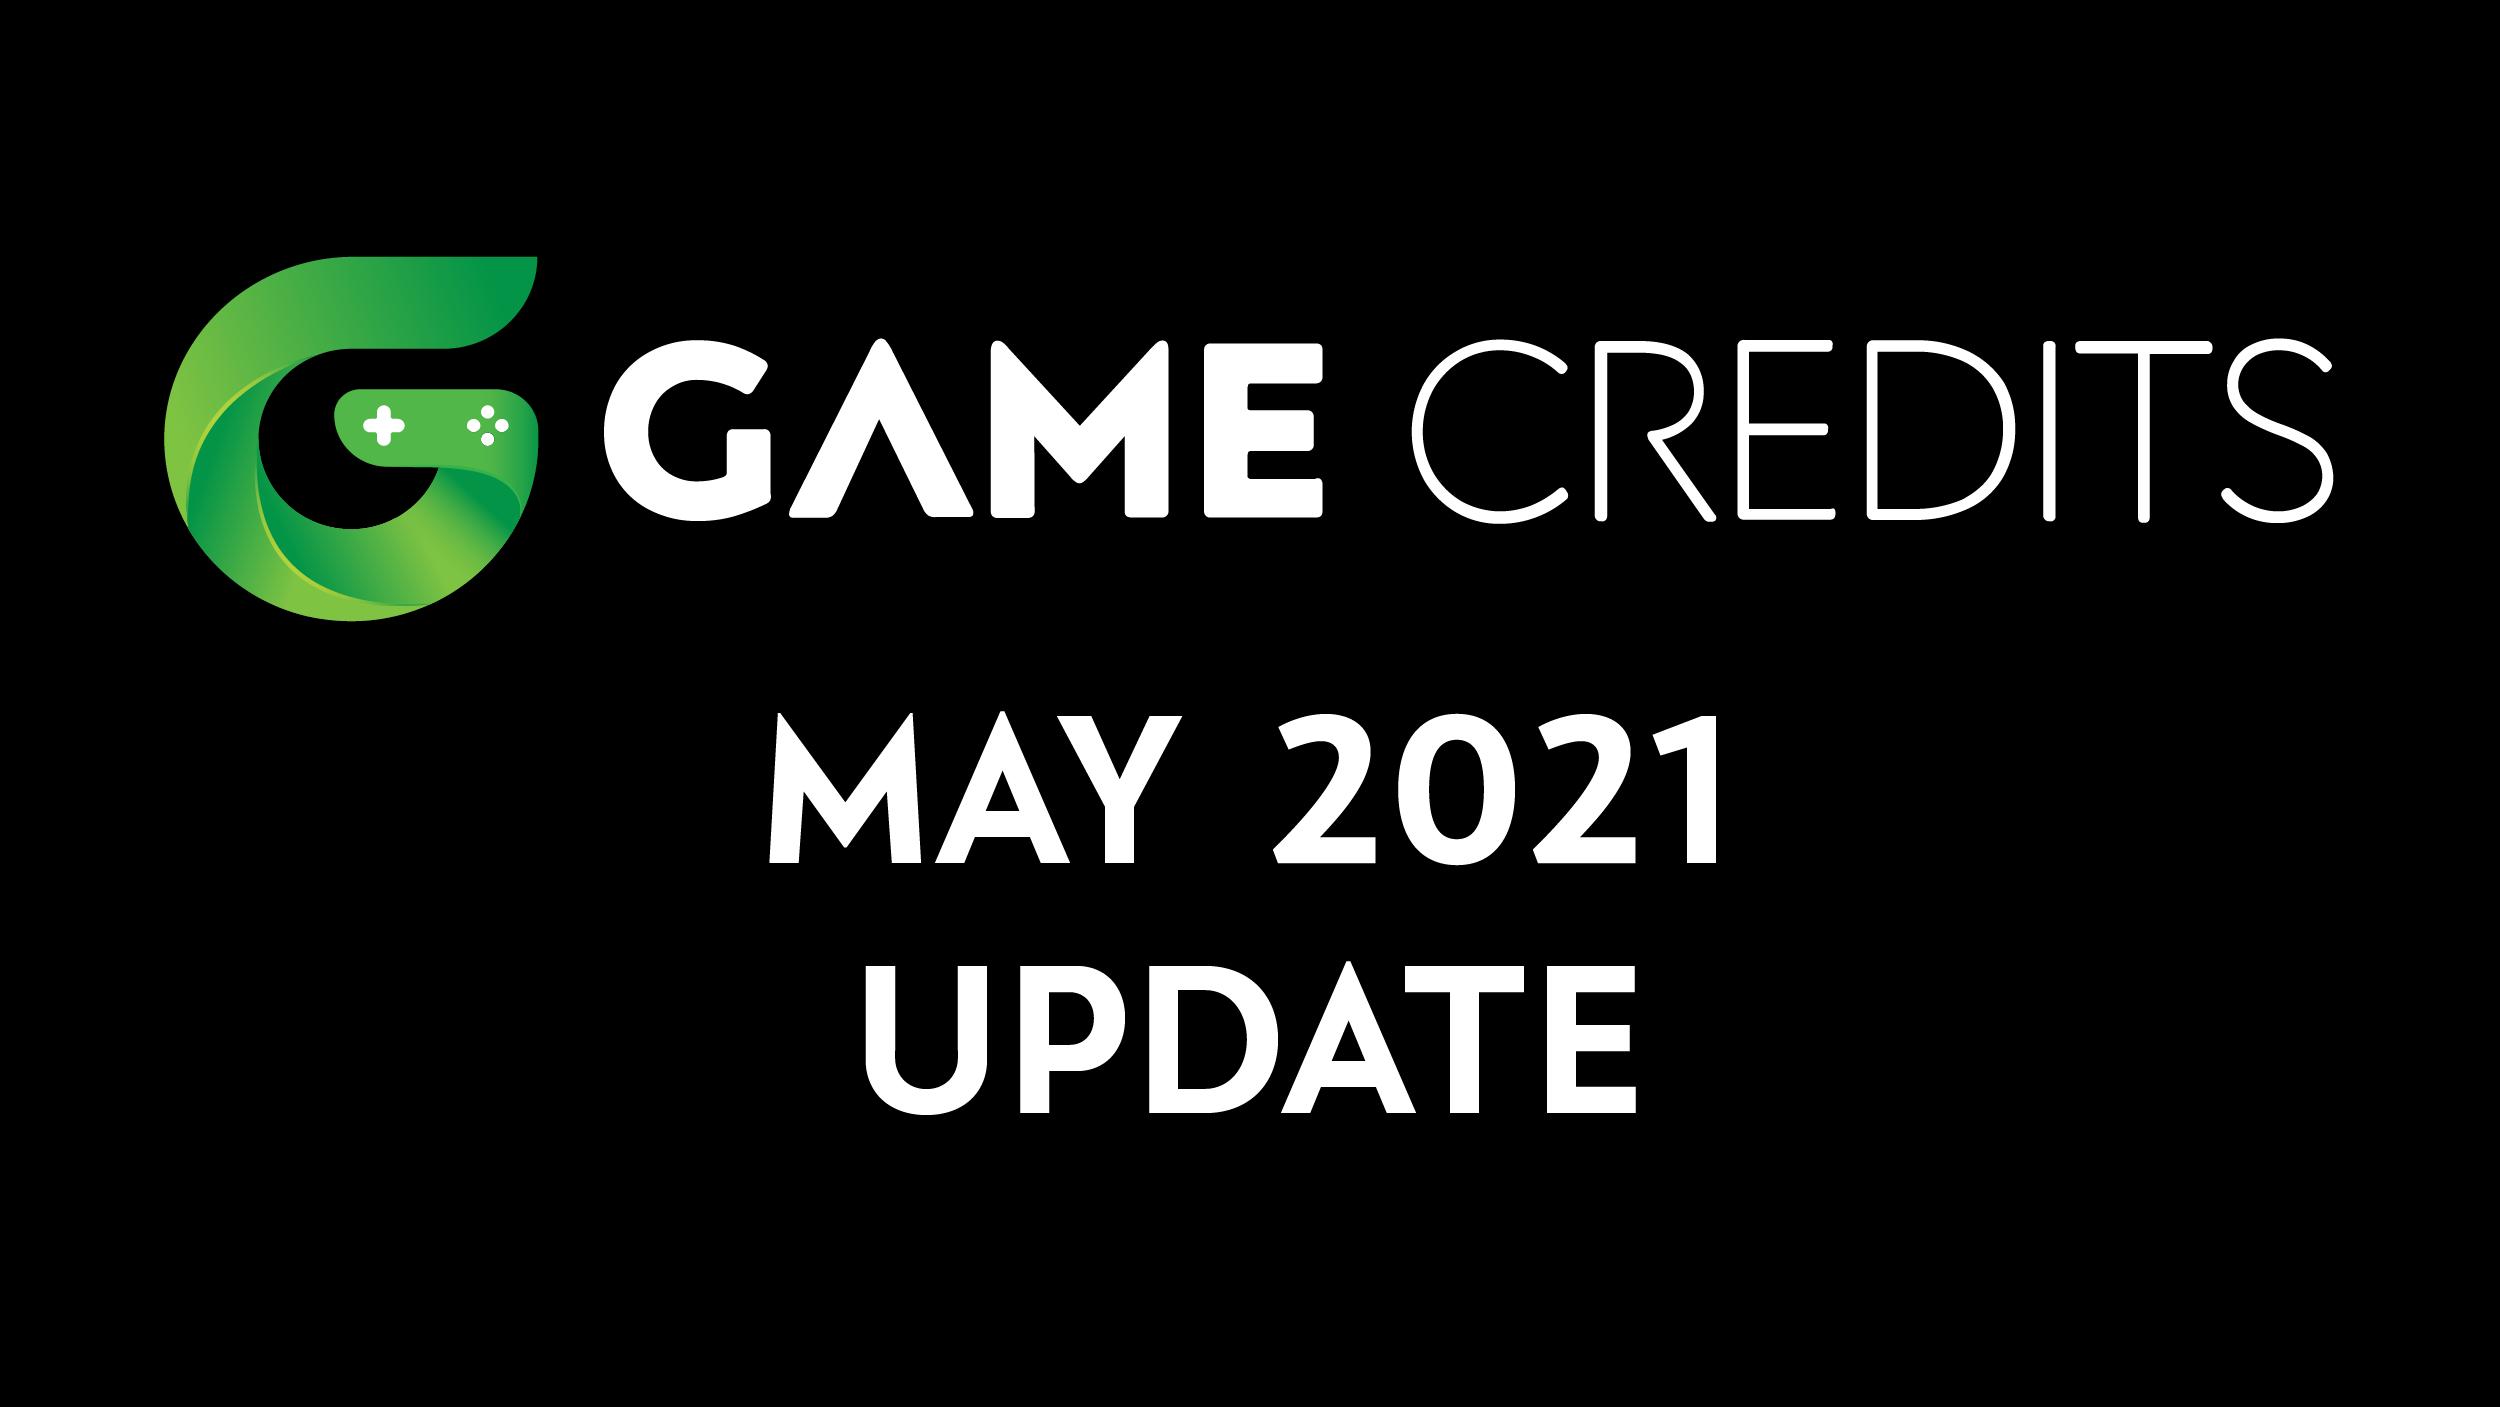 GAME Credits May 2021 Update - GAME Credits